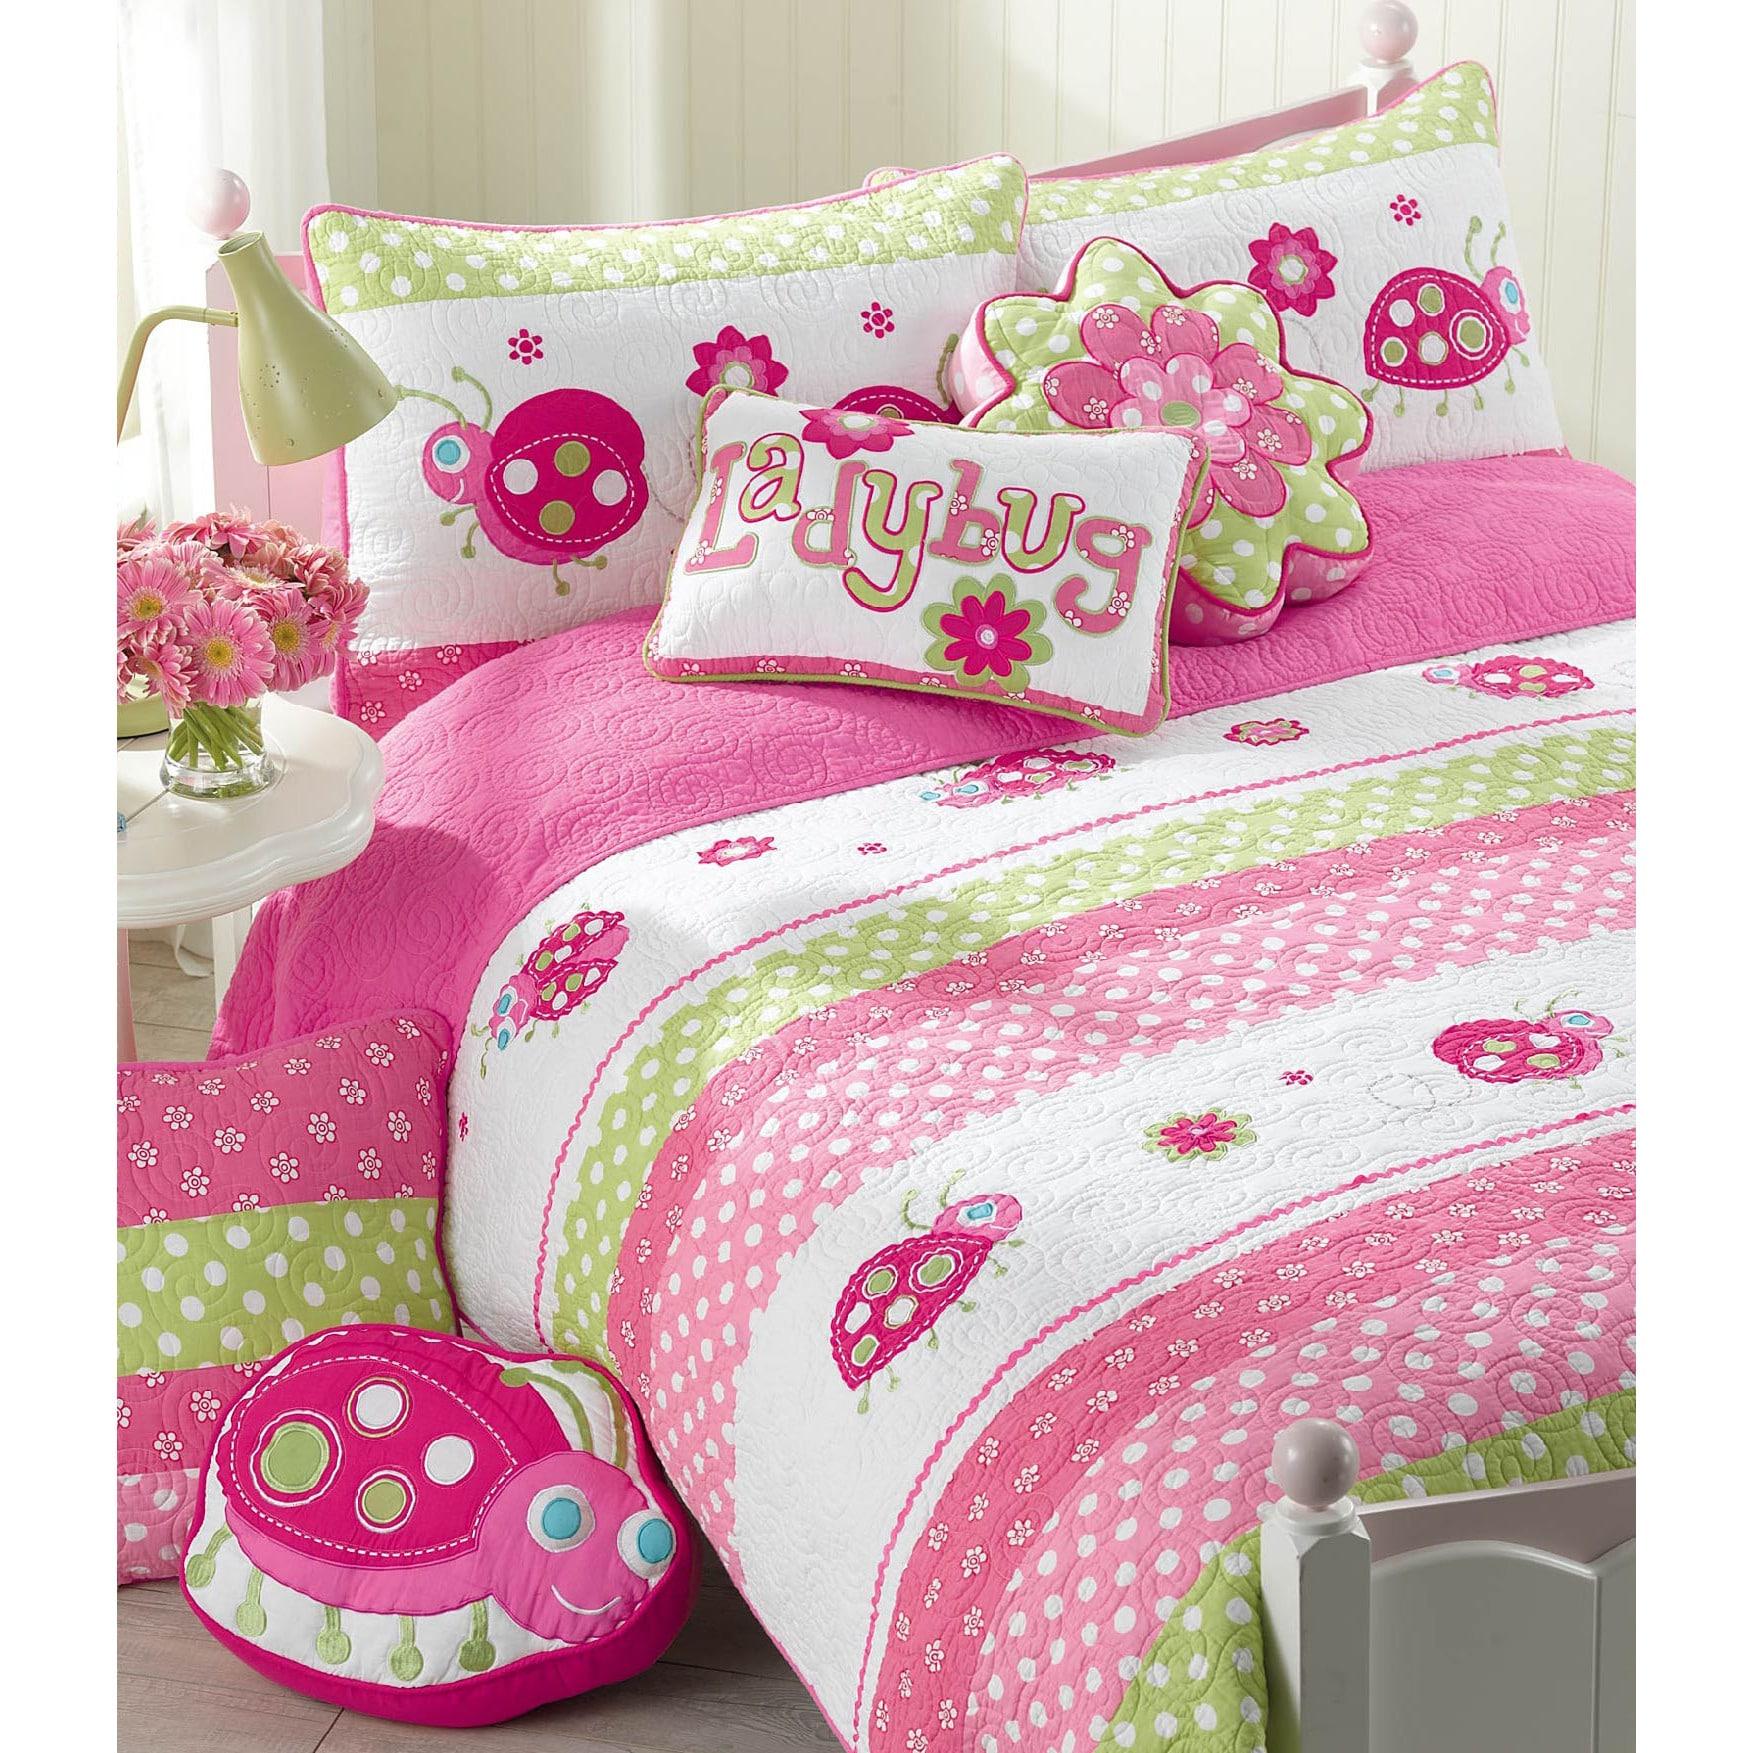 Cozy Line Home Fashions, Inc. Pink Ladybug 3-piece Quilt Set